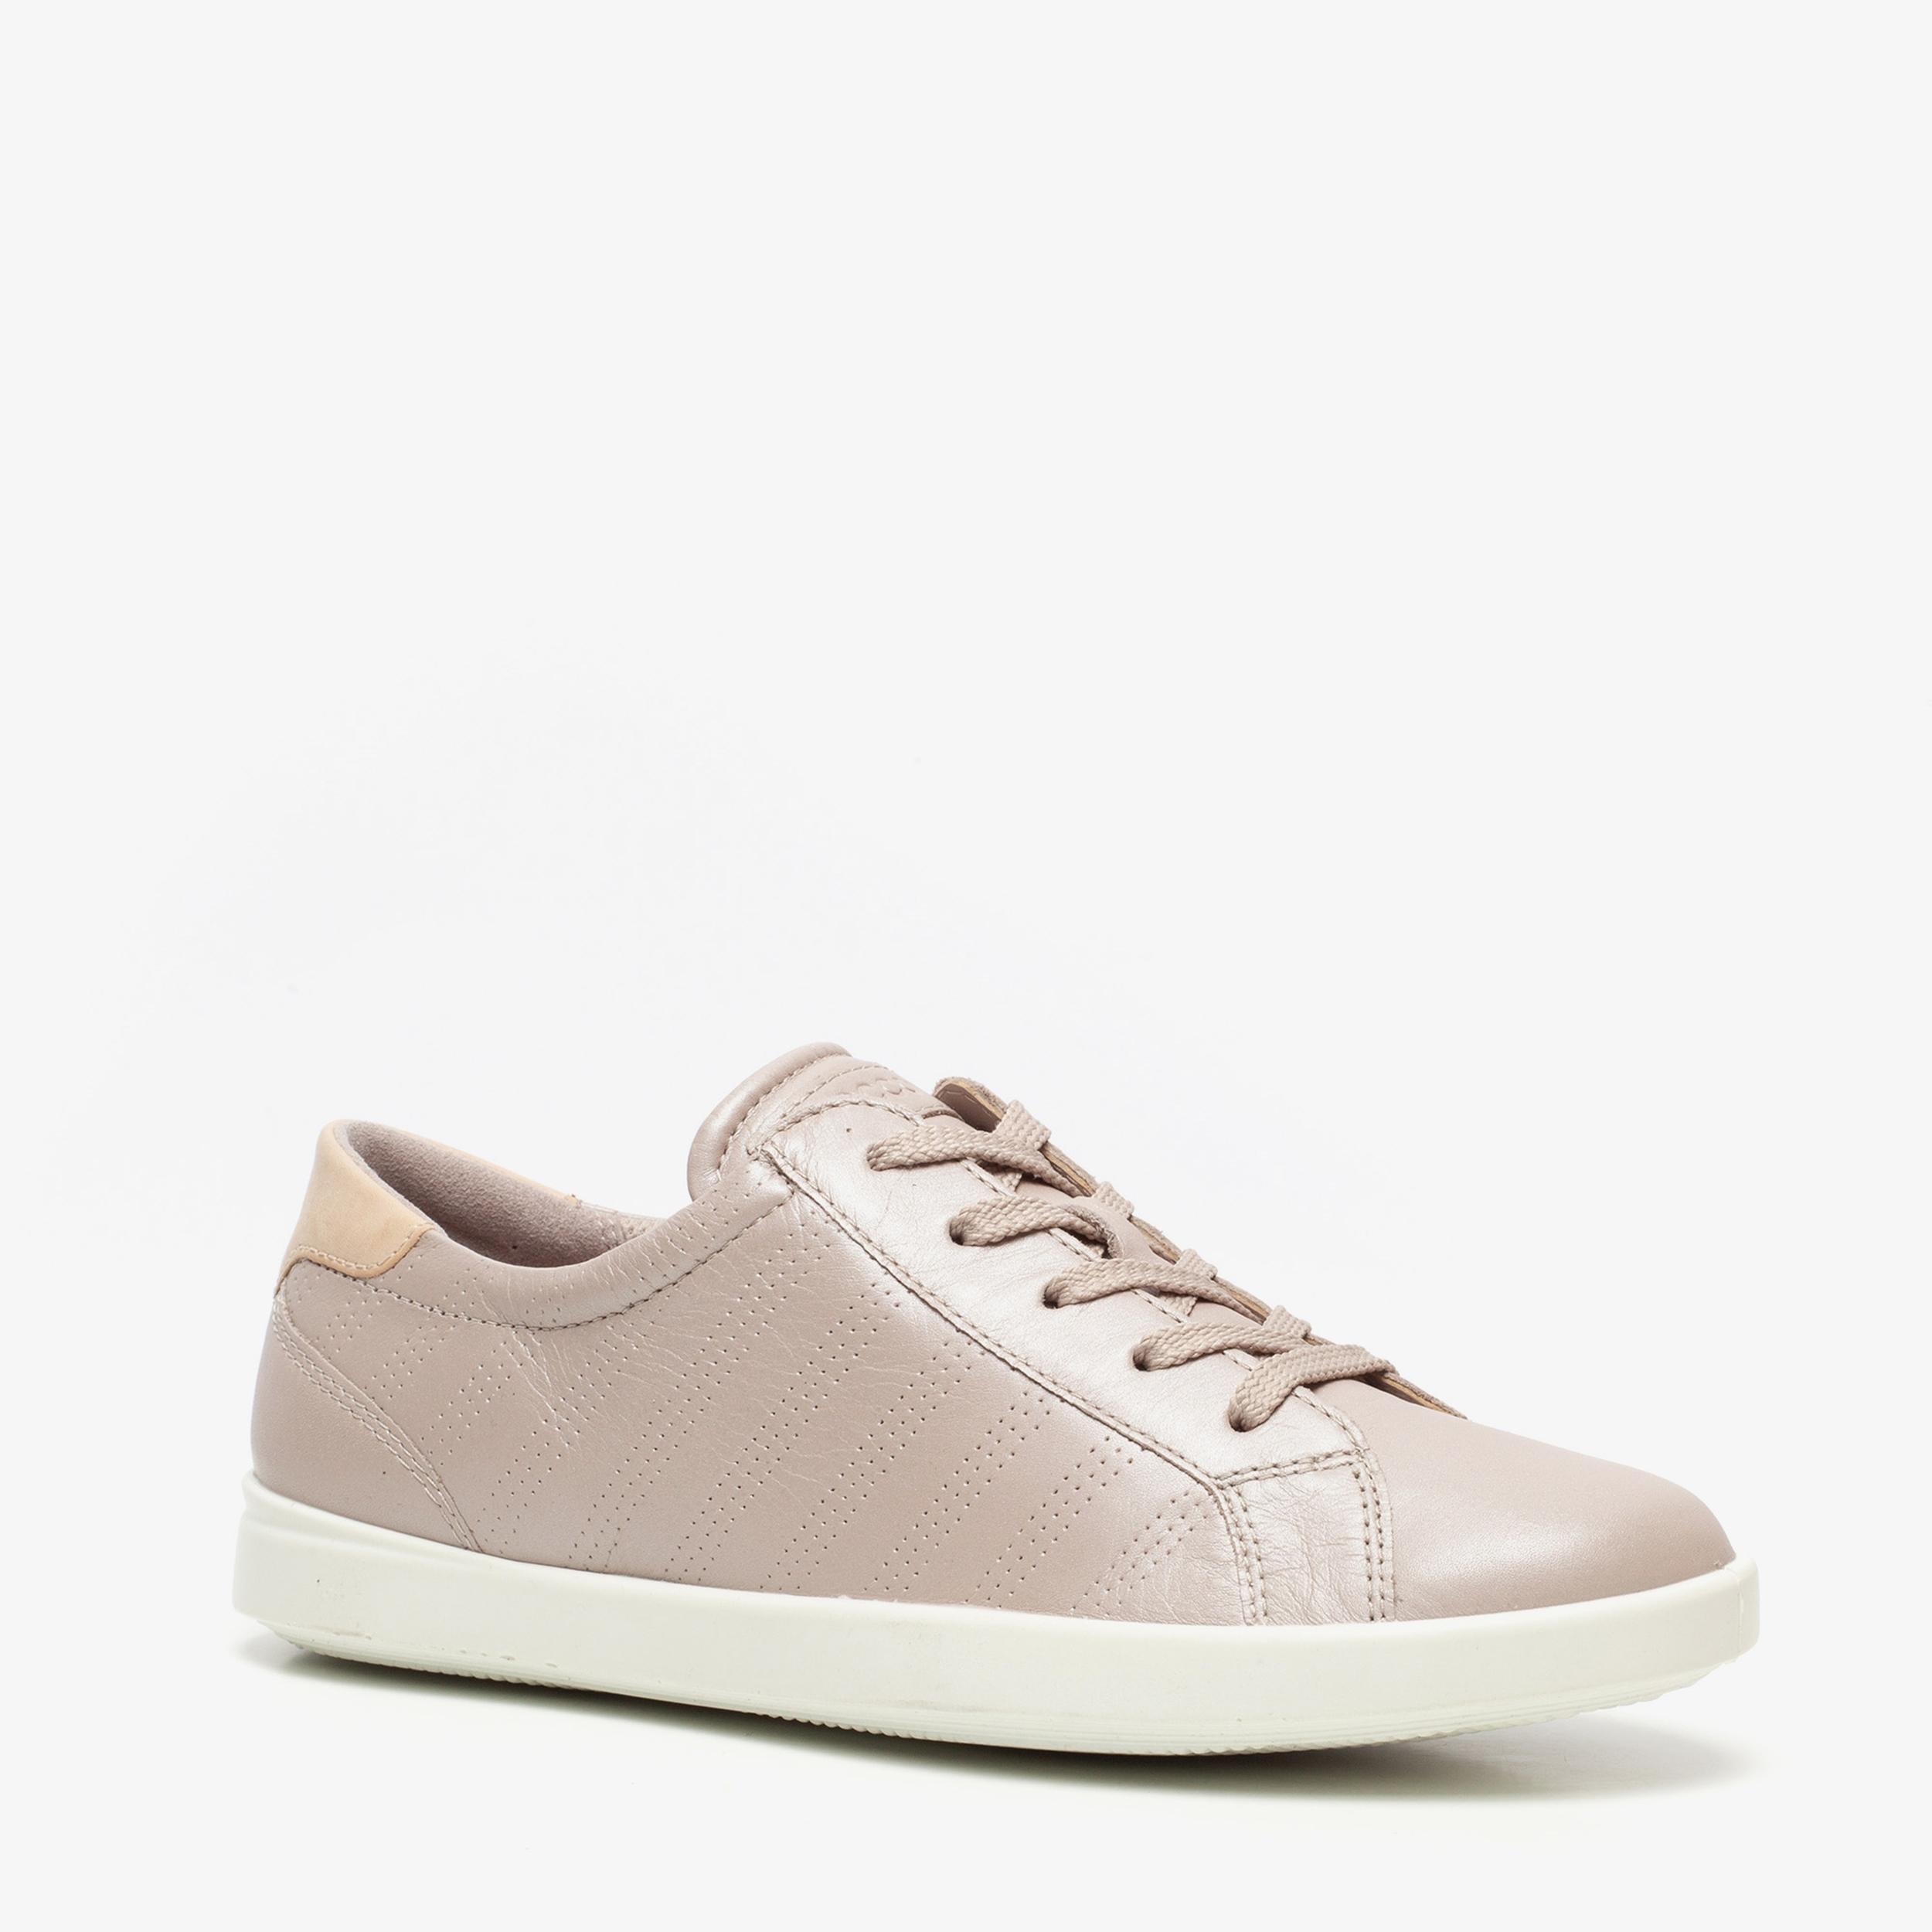 ECCO Leisure leren dames sneakers | Scapino.nl